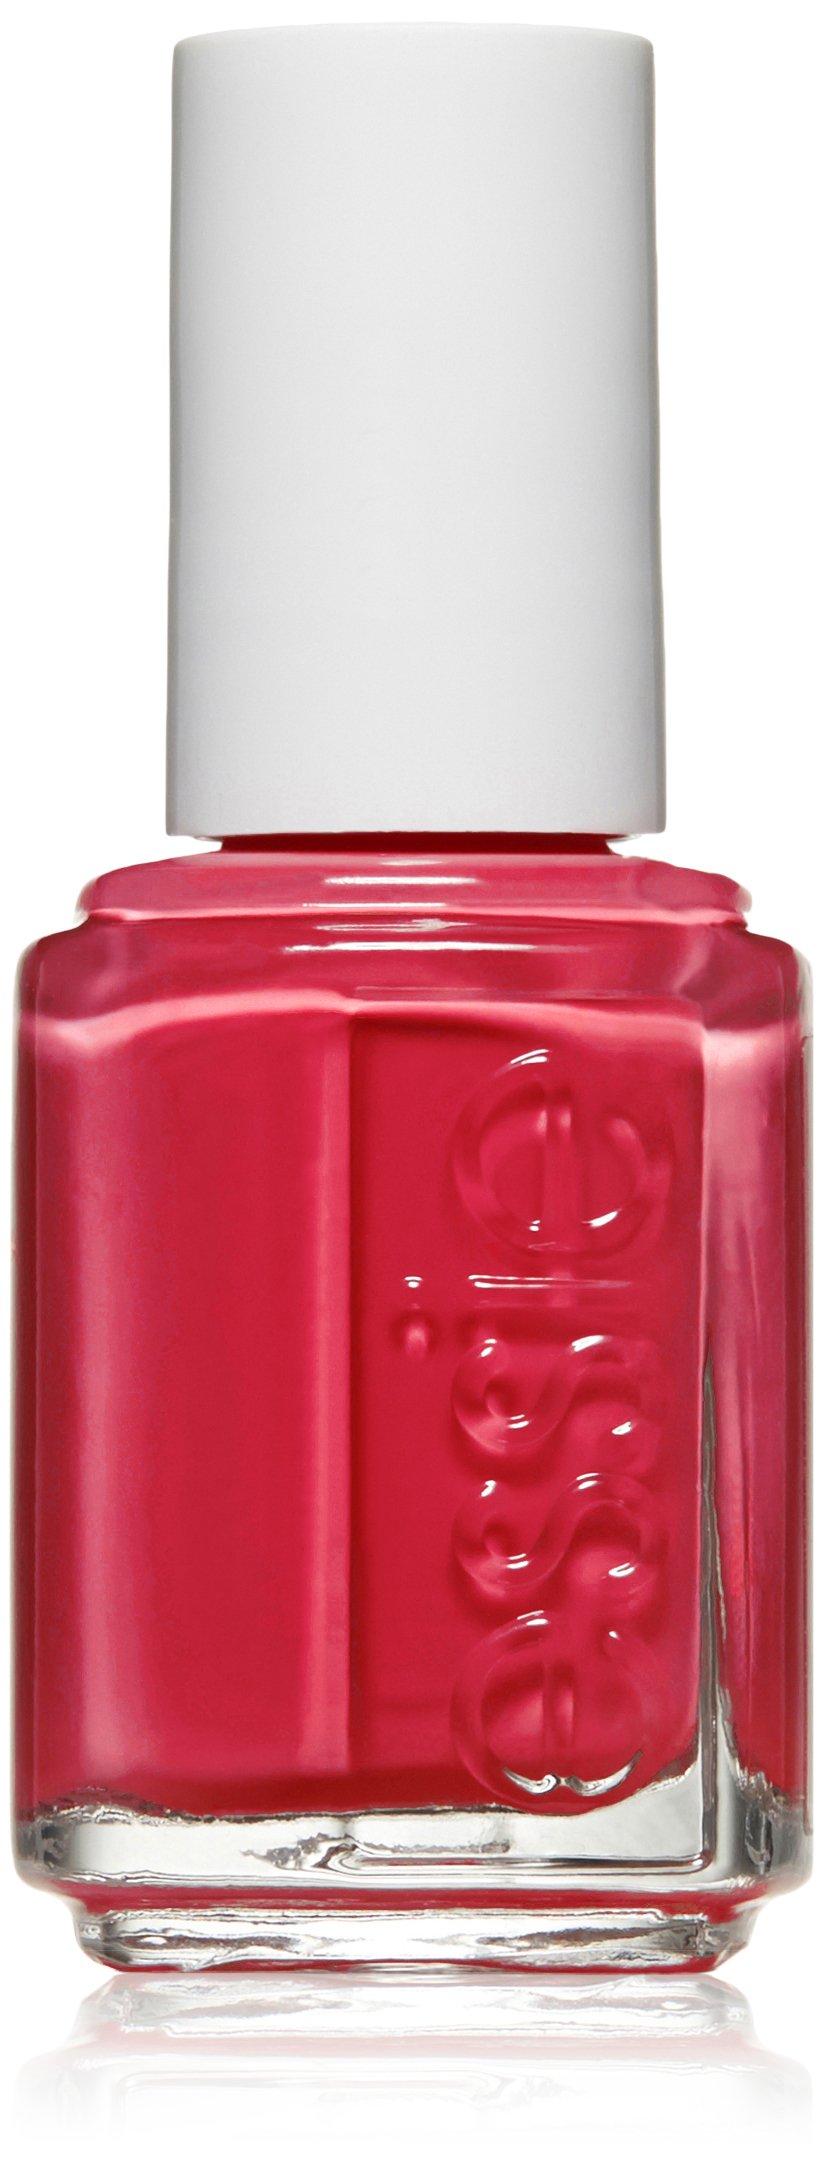 Amazon.com : essie nail polish, plumberry, berry red nail polish ...